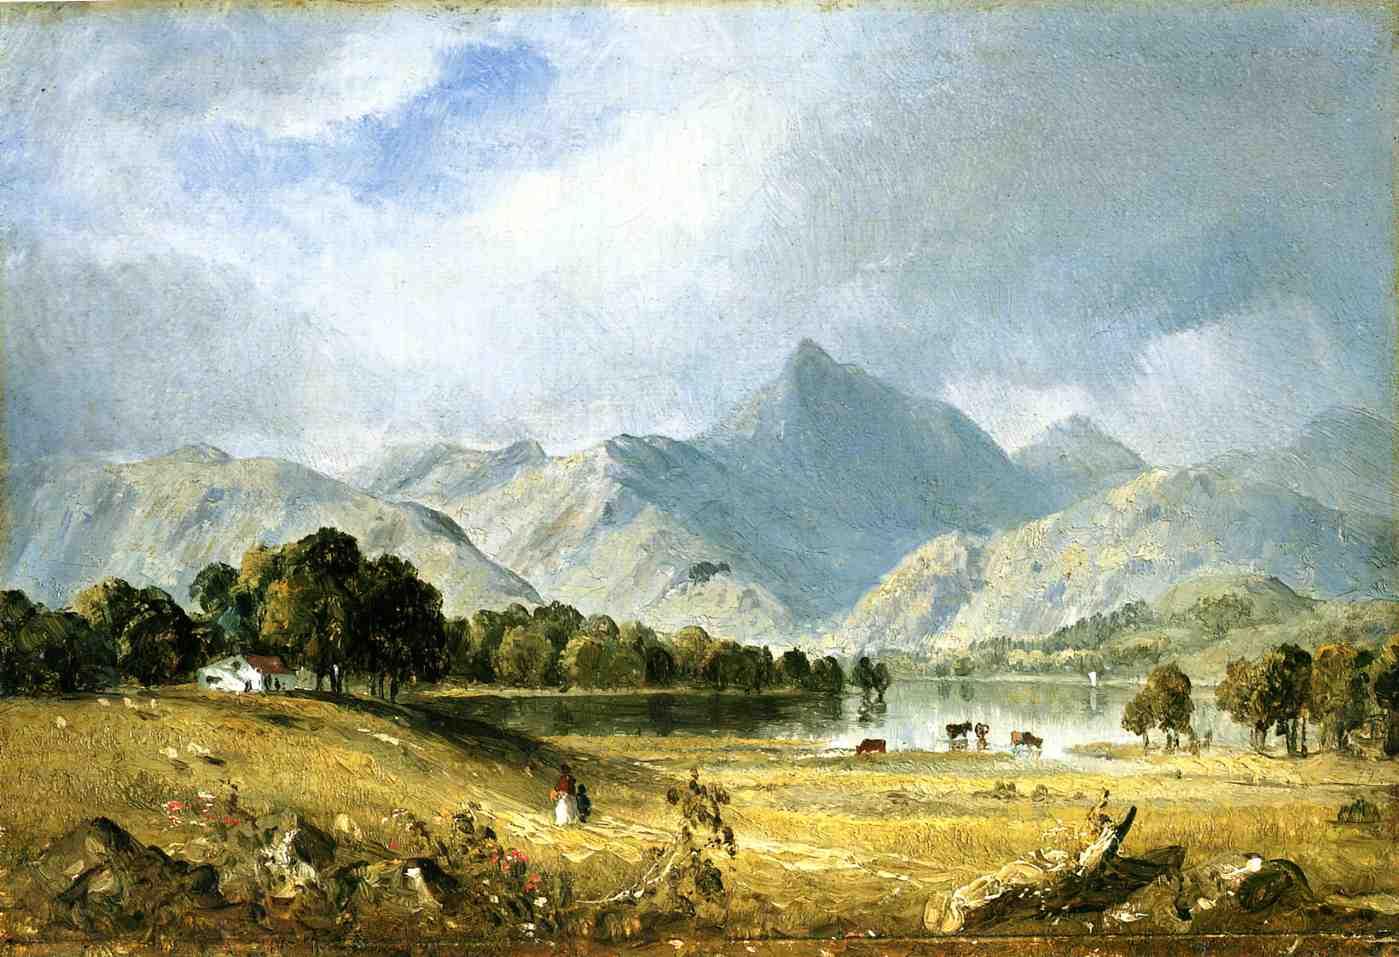 A Sketch of Derwentwater 1855 | Sanford Robinson Gifford | Oil Painting